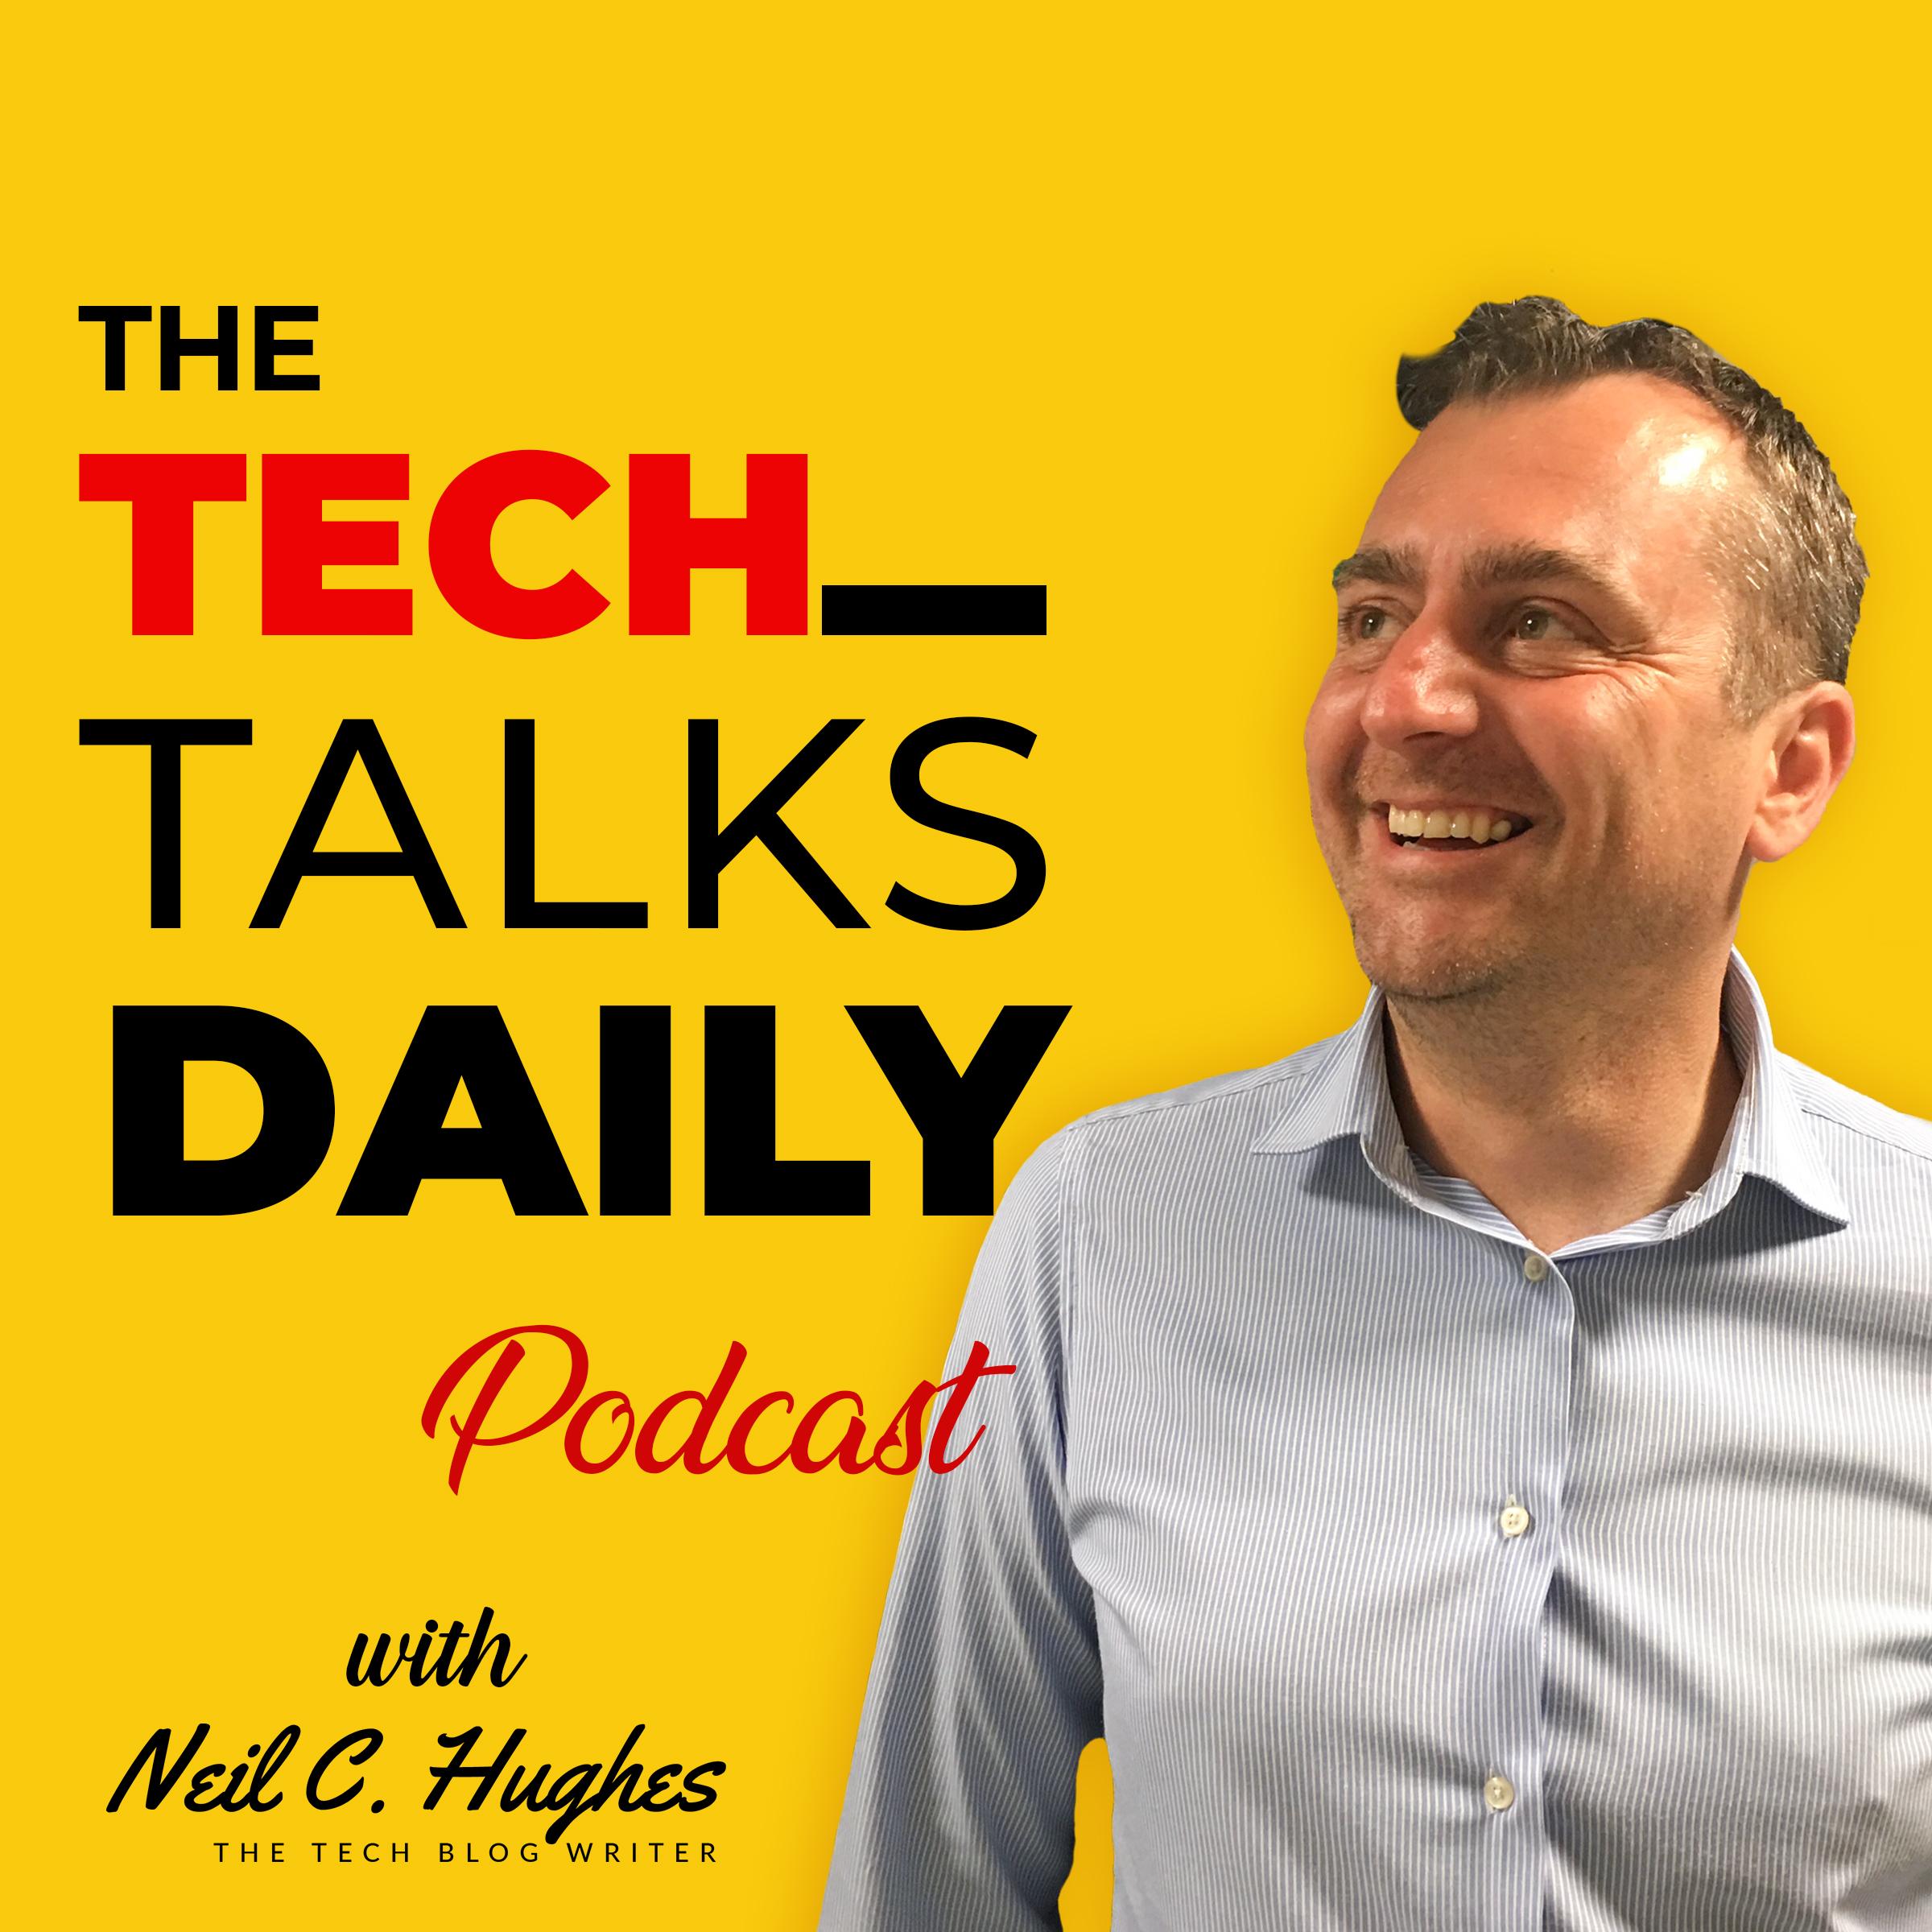 The Tech Talks Daily Podcast